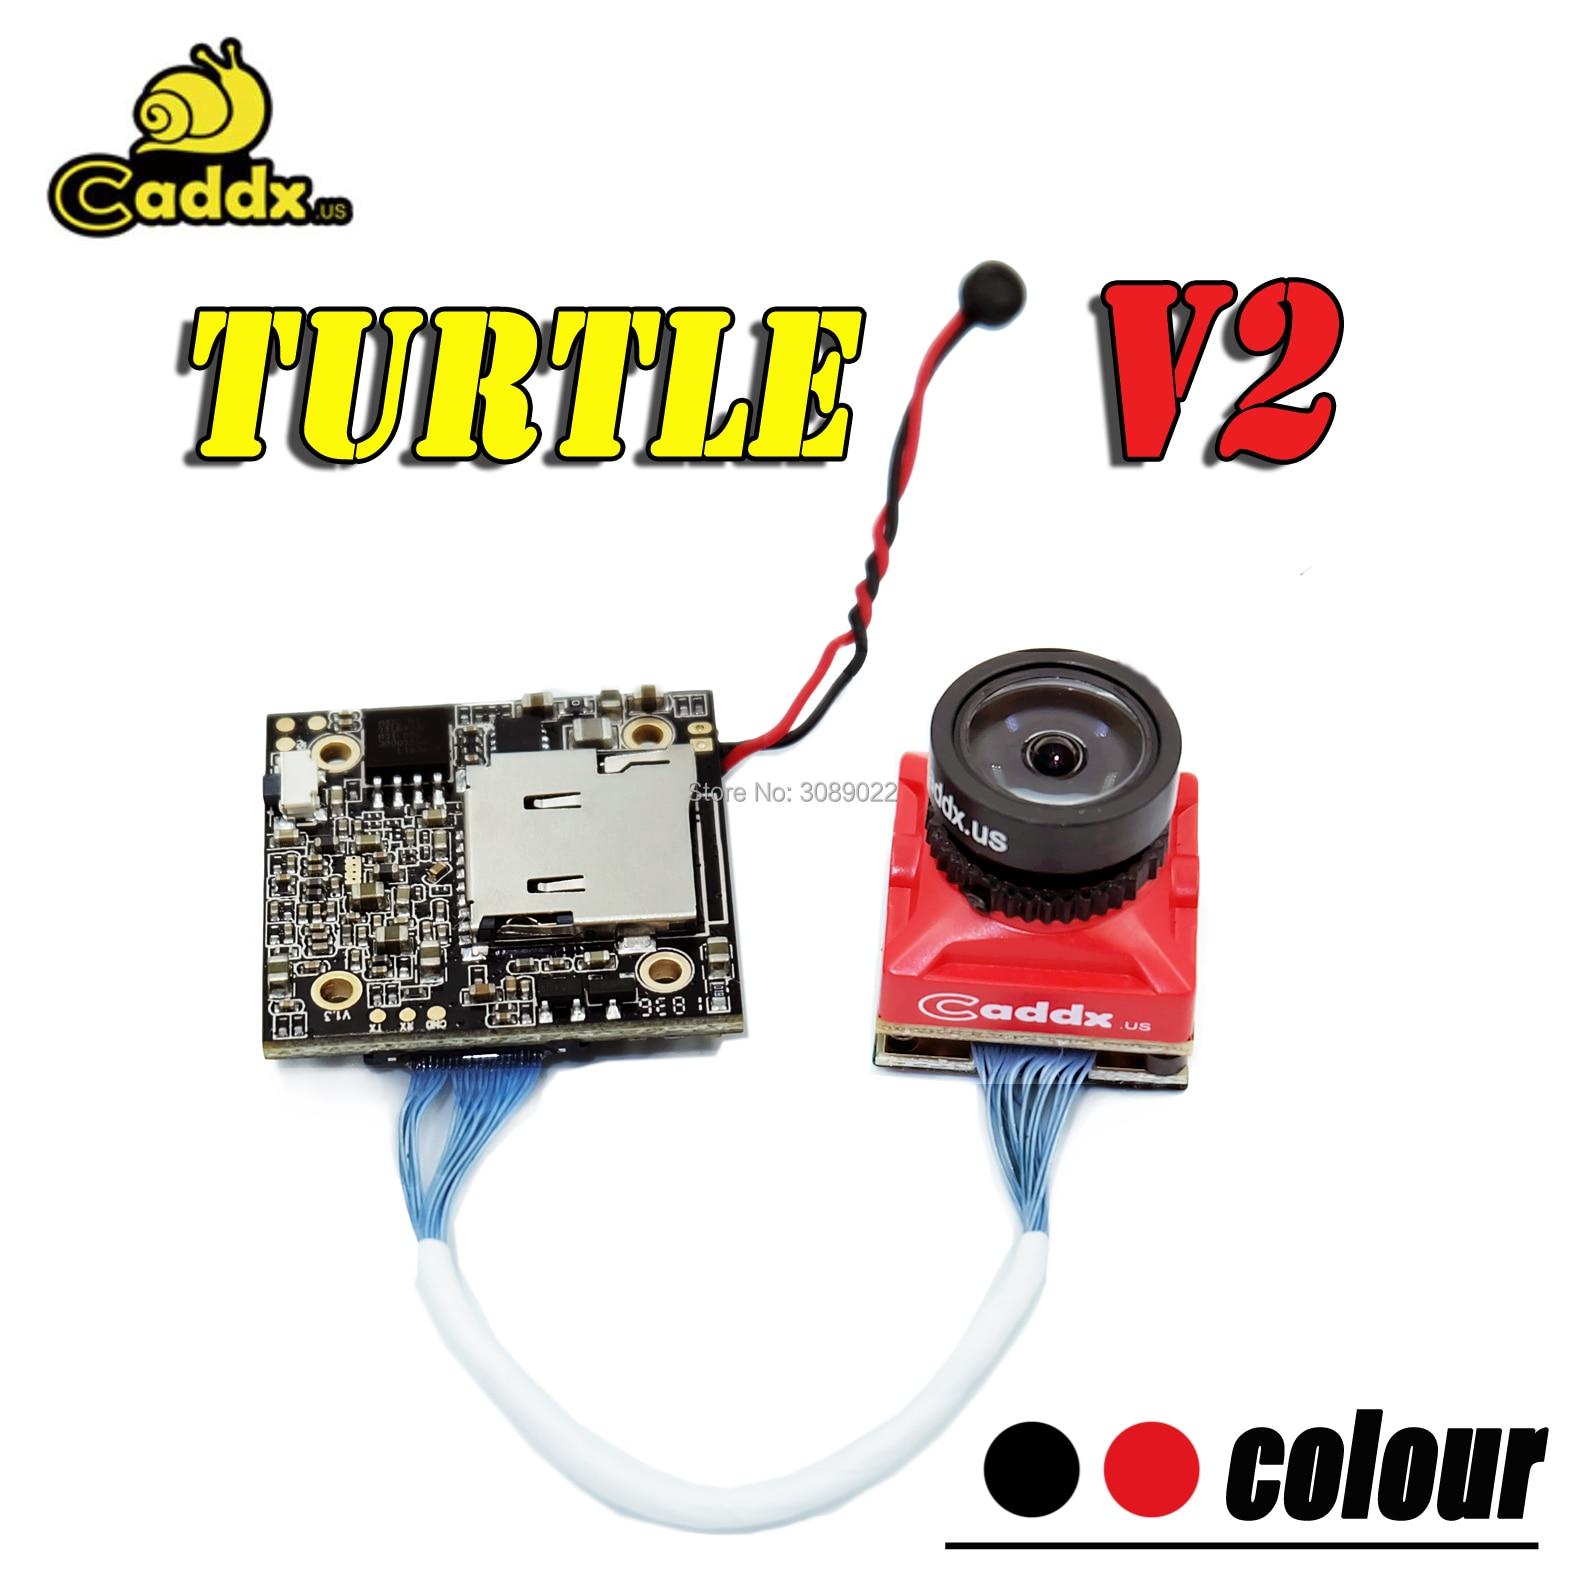 Caddx Turtlet V2 1080P 60fps 2 7 Inch 800TVL HD FPV Camera FOV 155 Degree NTSC